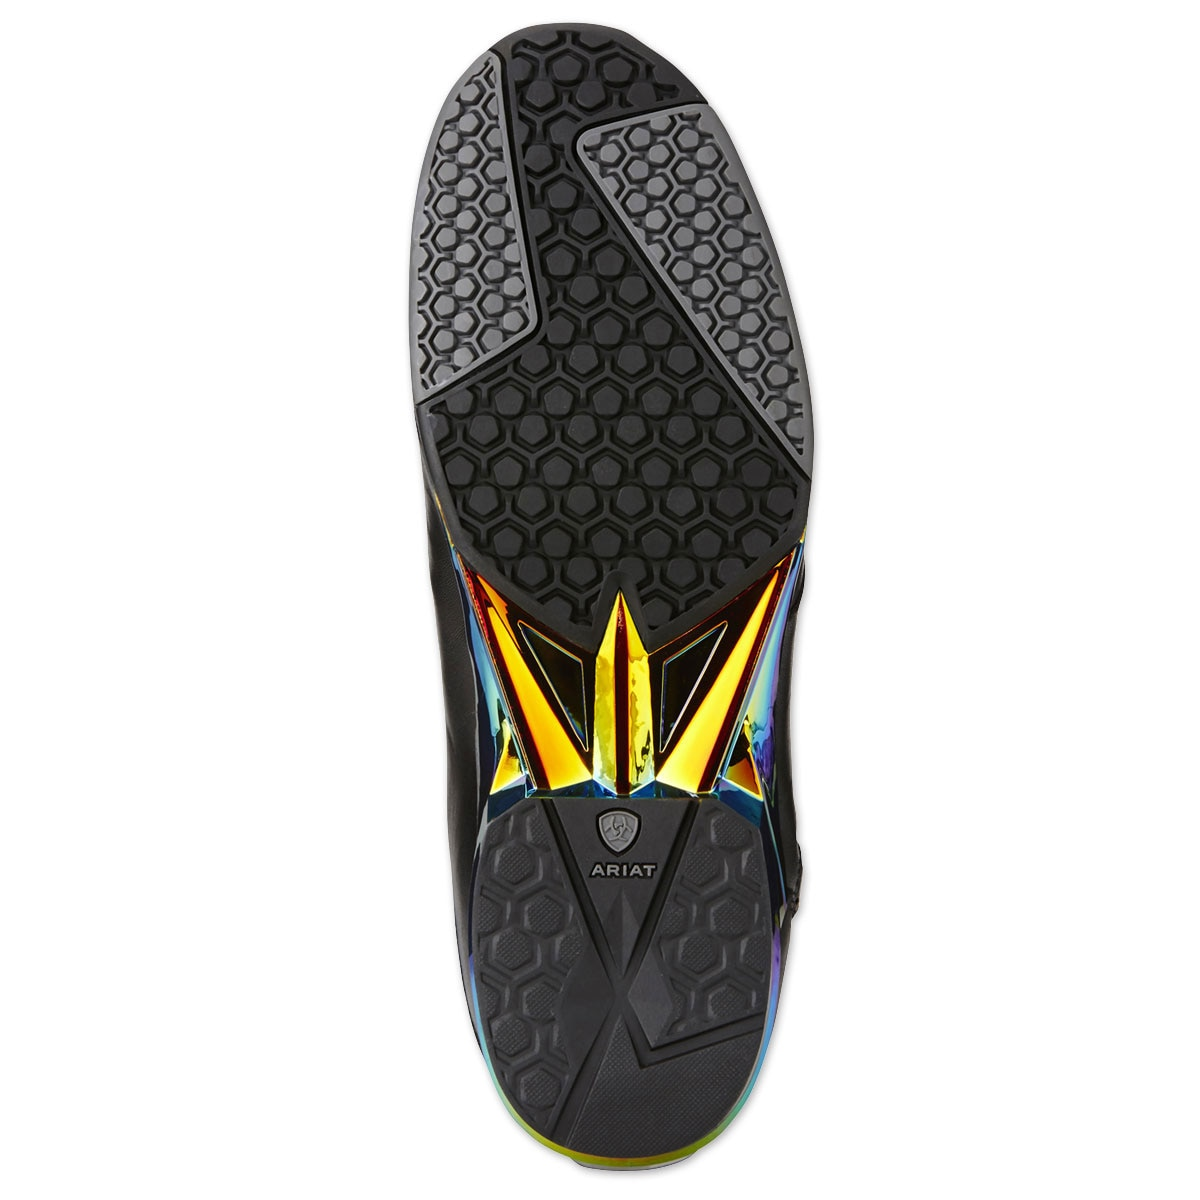 Ariat Vortex Tall Boot e6cf3eadc